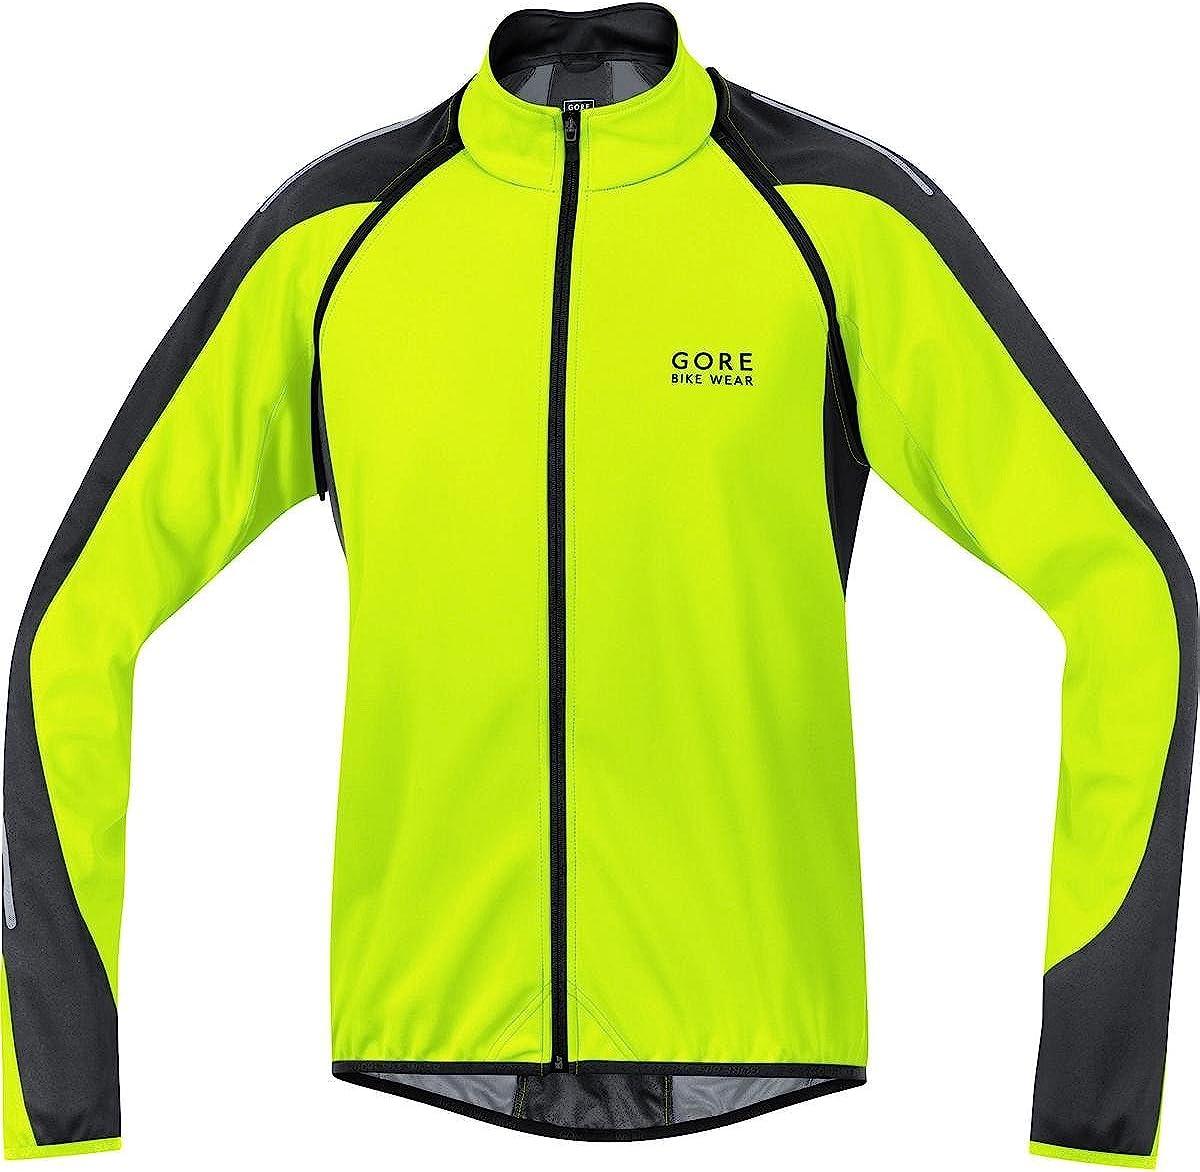 Gore  Bike Wear Phantom 2.0 Windstopper Soft Shell - Chaqueta 3 en 1 para Ciclista de Carretera, Hombre, Amarillo Neón/Negro, XL